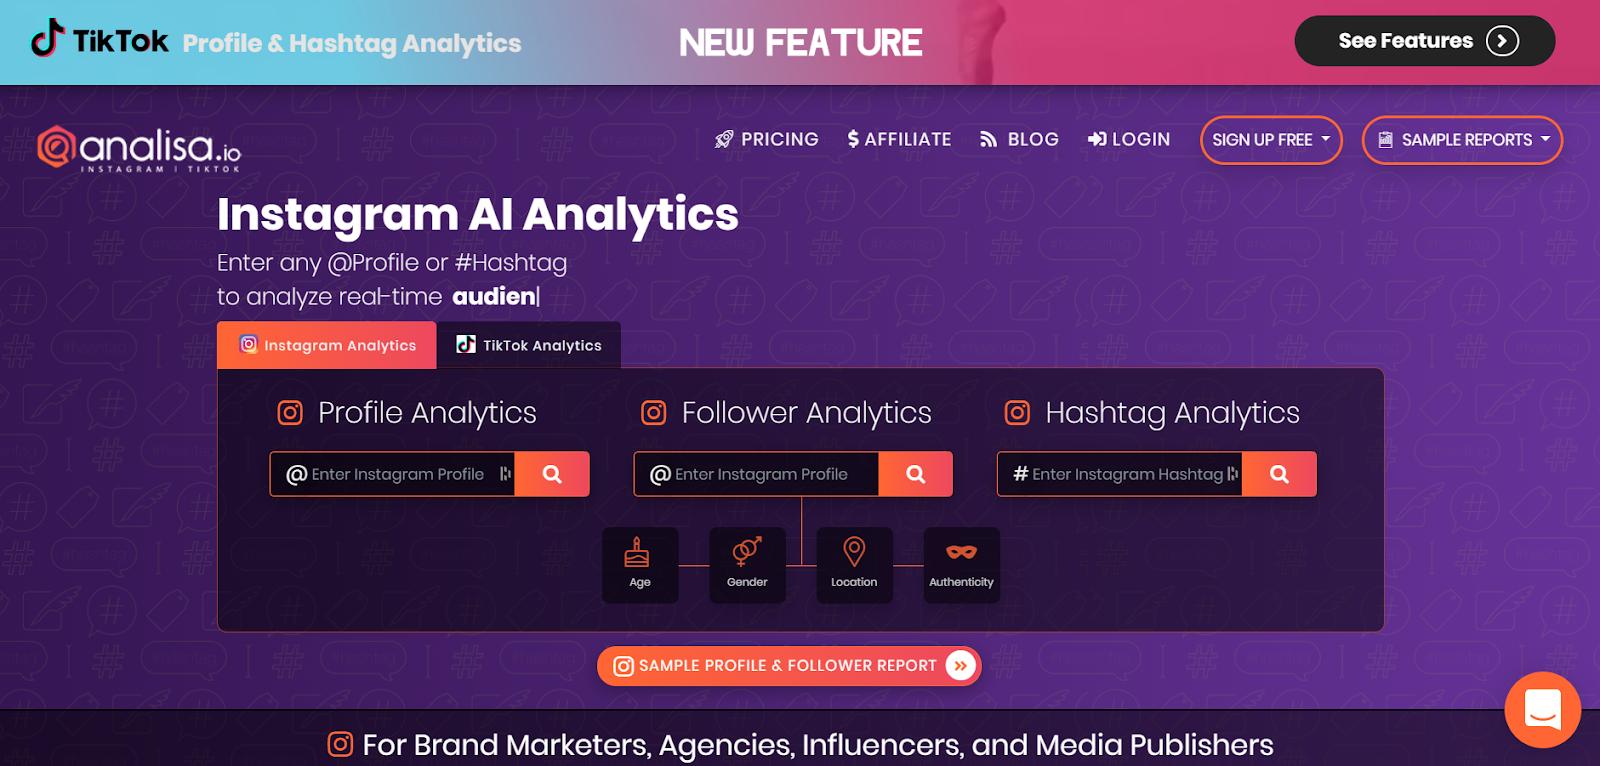 social media marketing tools for Instagram and TikTok